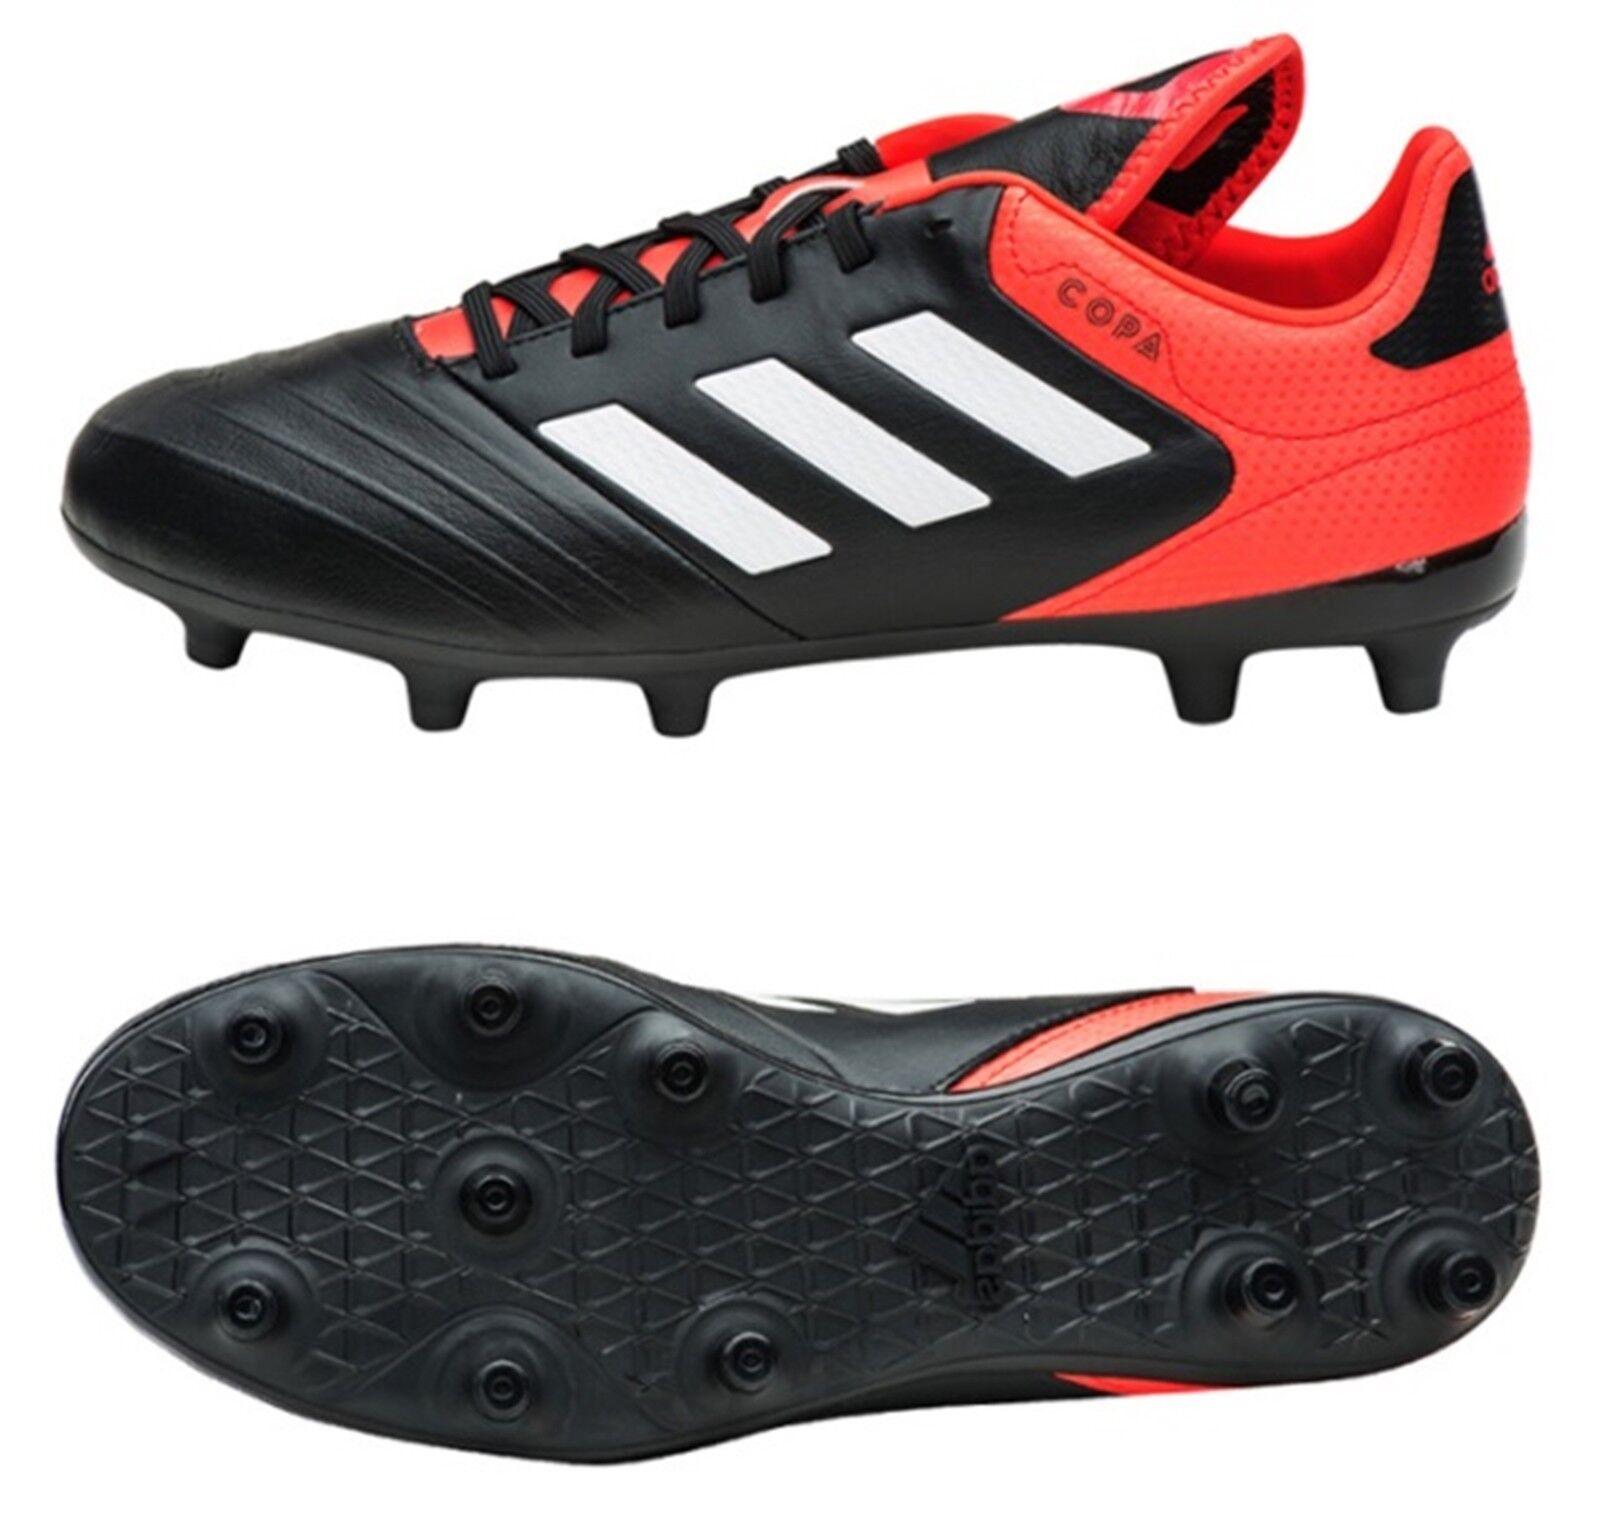 Botines Adidas Hombres Copa 18.3 Fg Fútbol Negro Rojo Zapatos De Fútbol Gimnasio Spike CP8957